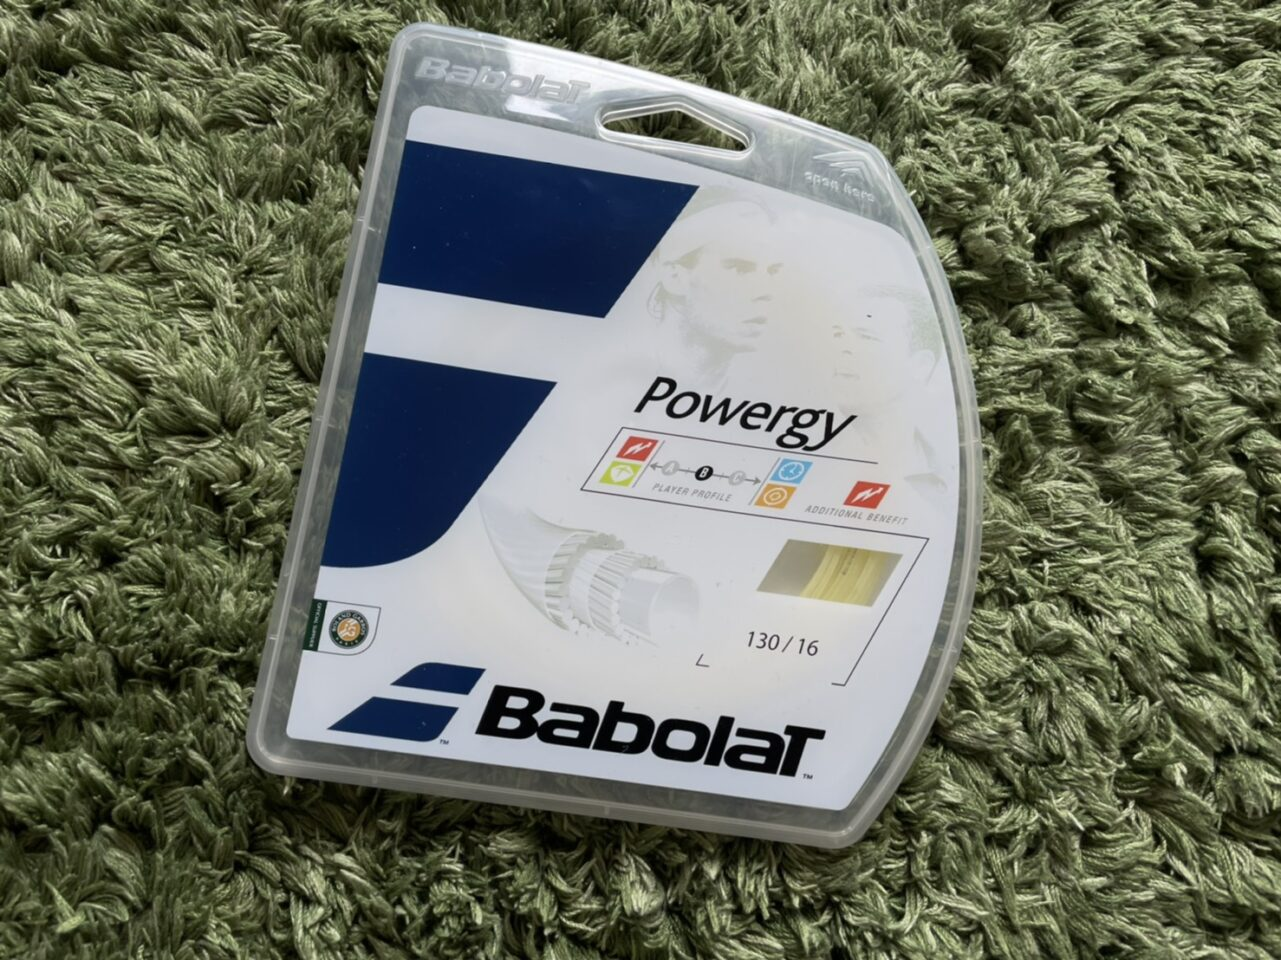 【BabolaT】シンガットフォース / パワジー|インプレ・レビュー